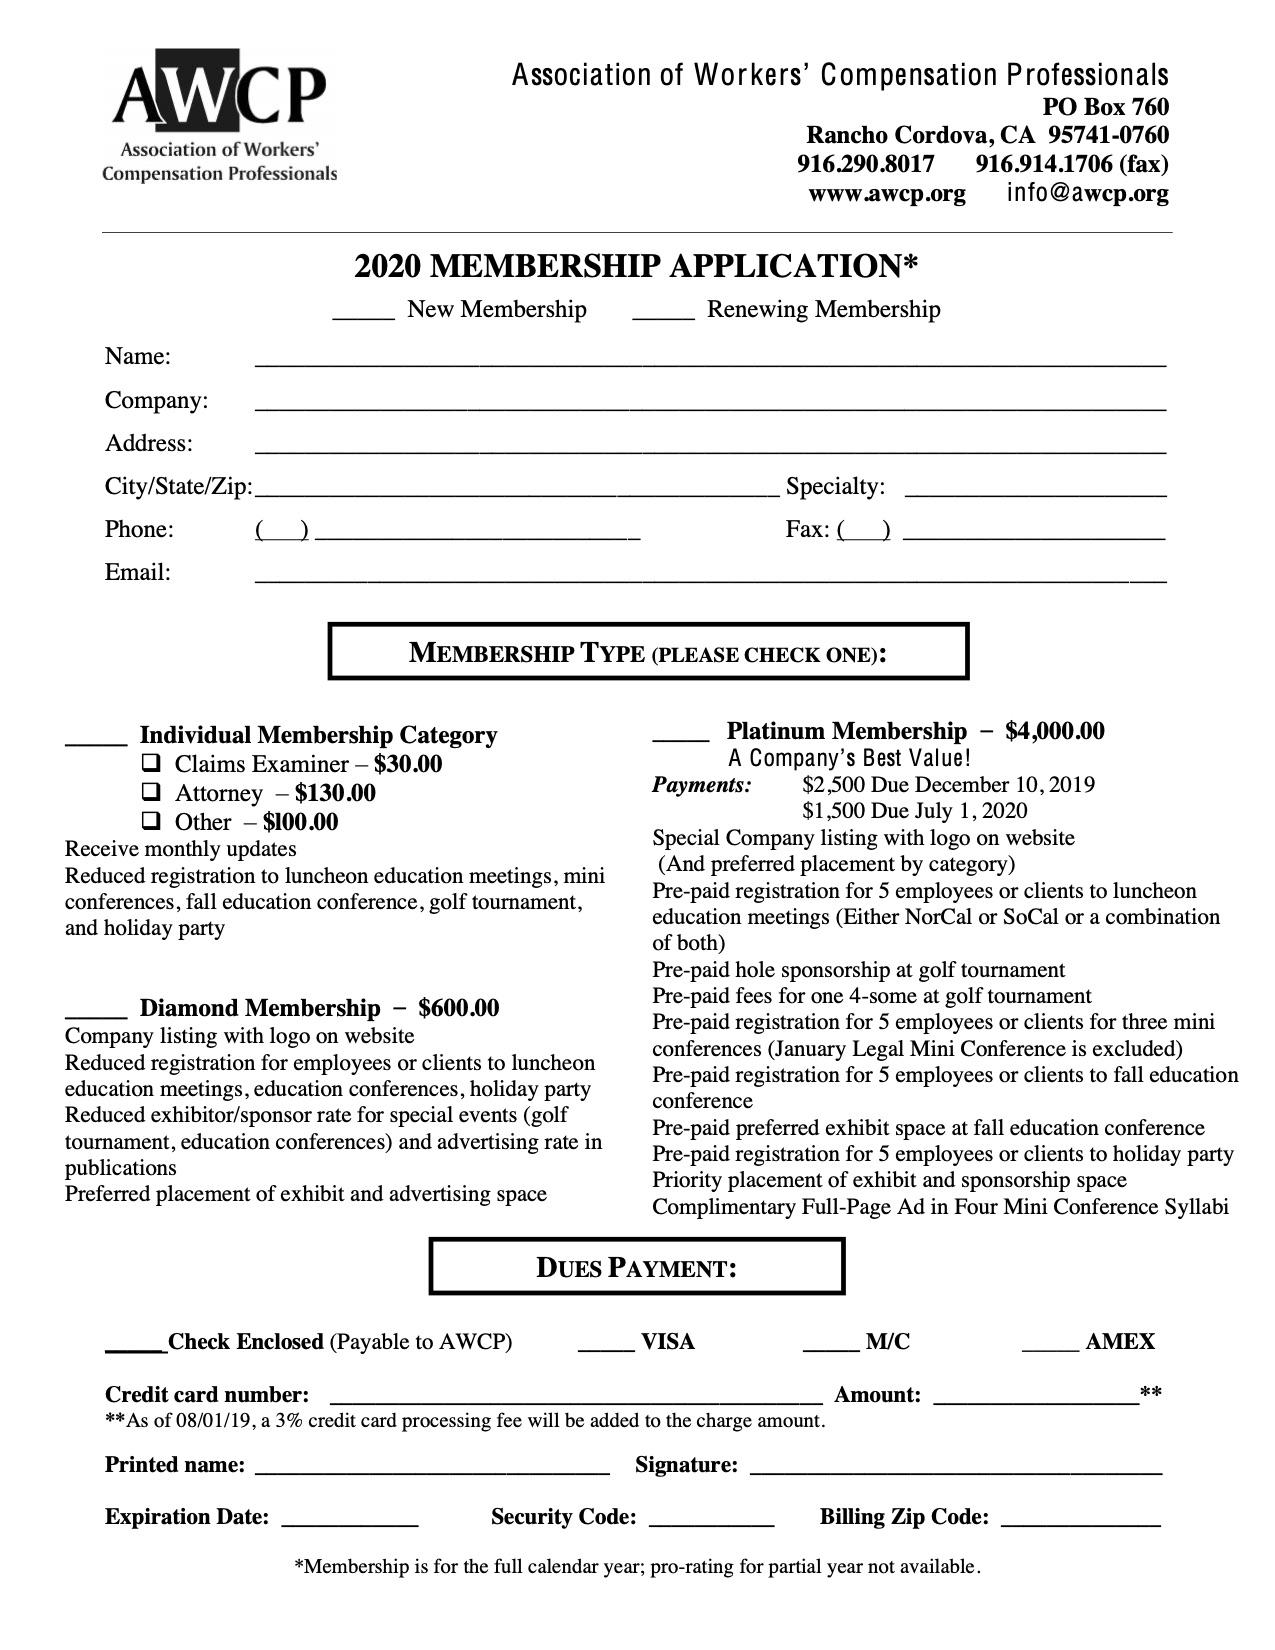 AWCP 2020 Membership Packet-2